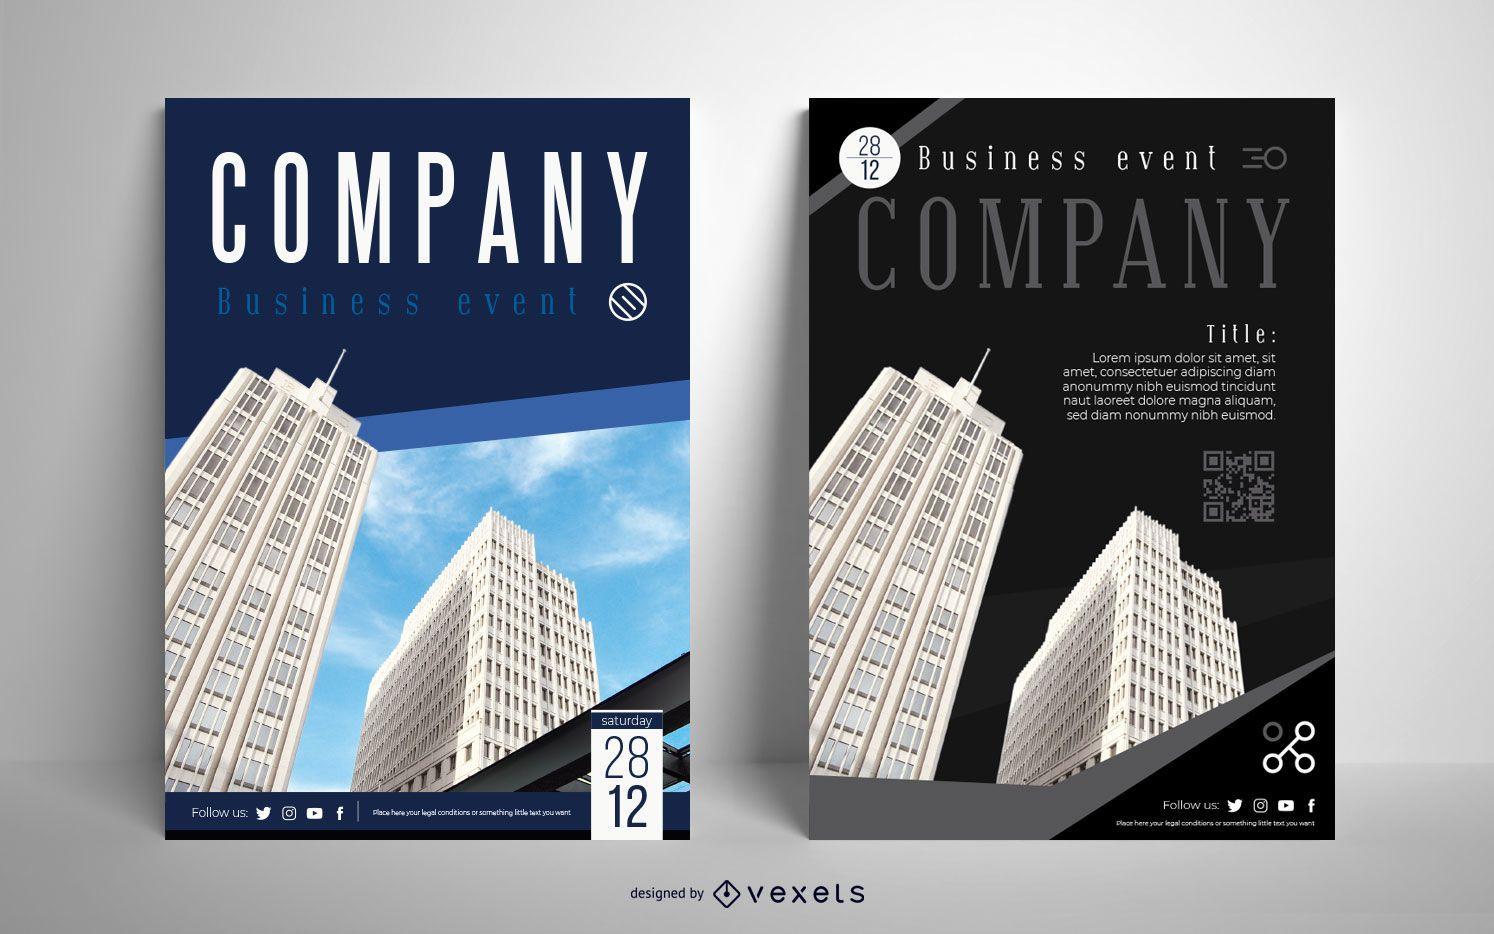 Company Building Editable Poster Design Set